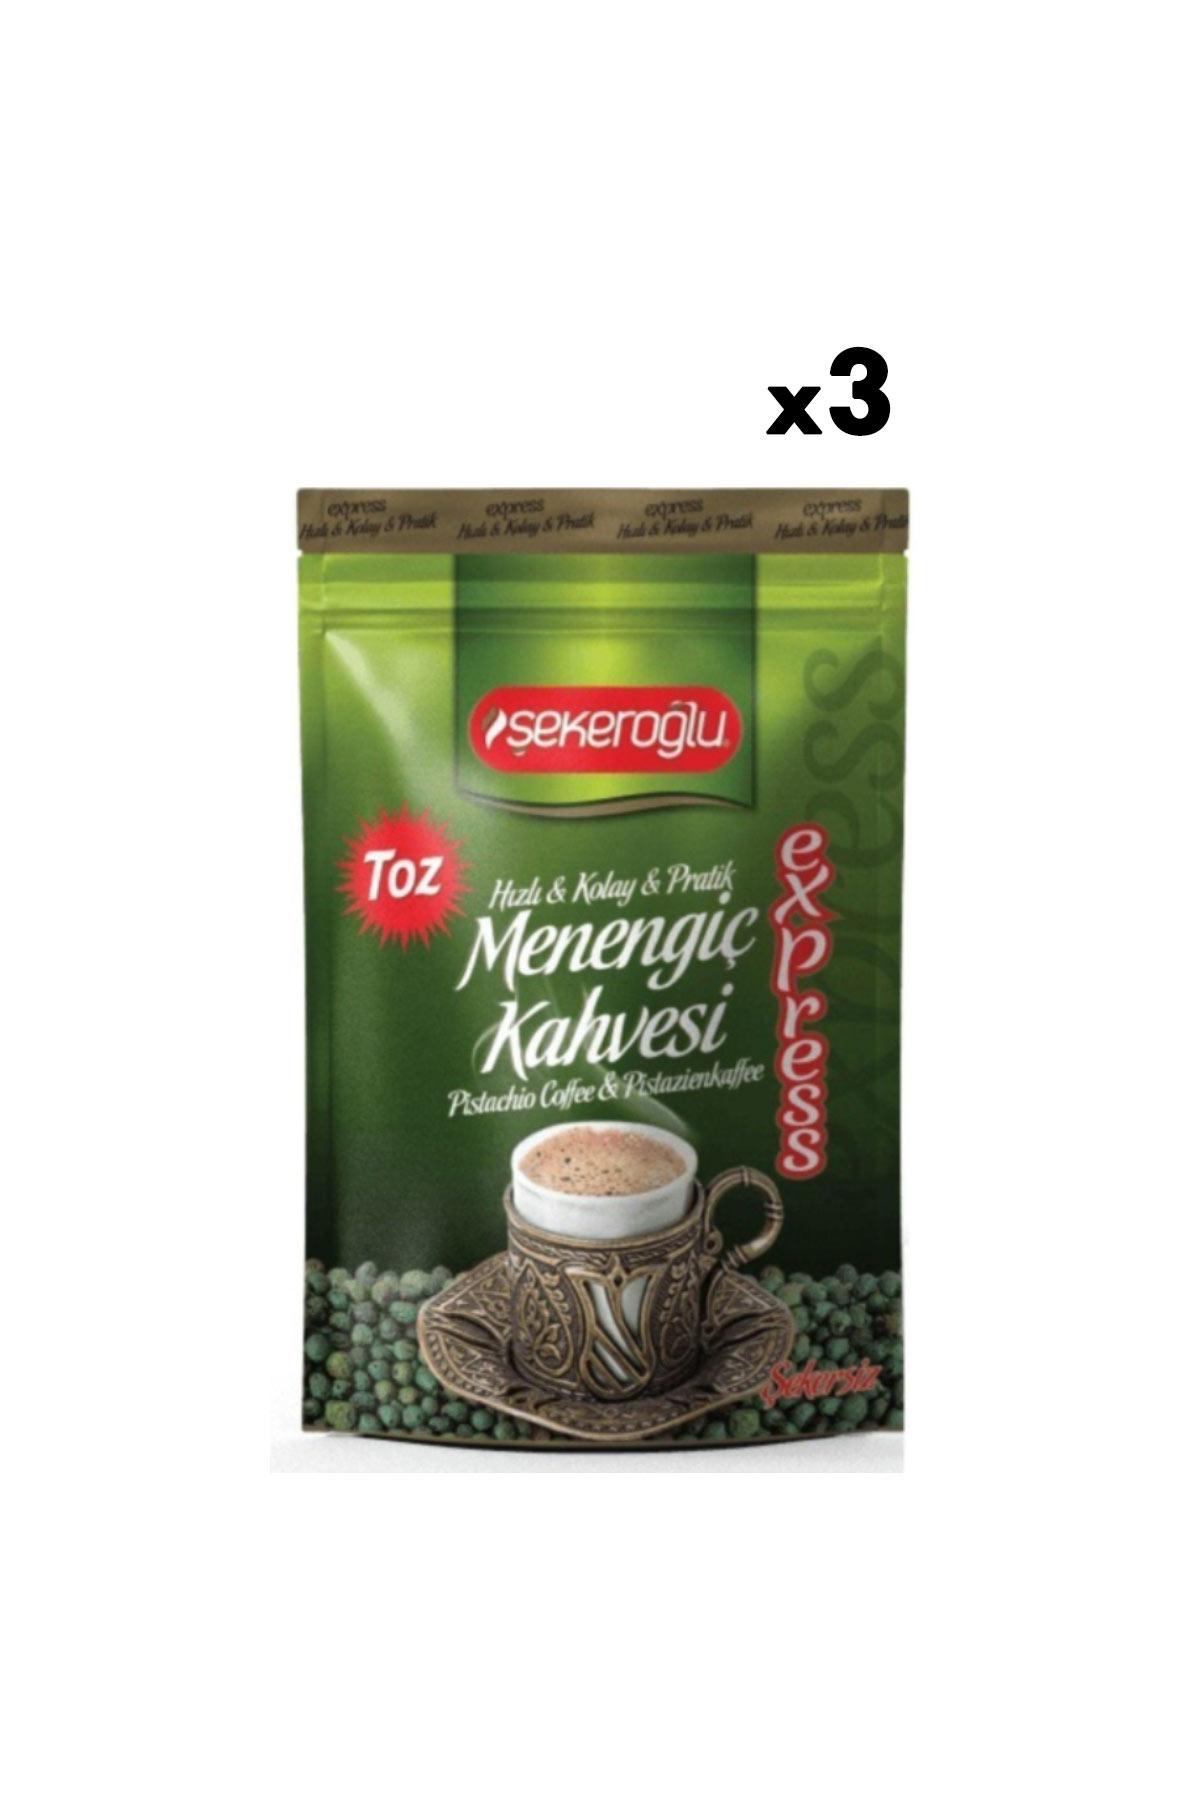 Şekeroğlu Express Toz Menengiç Kahvesi 200 Gr X 3 Adet